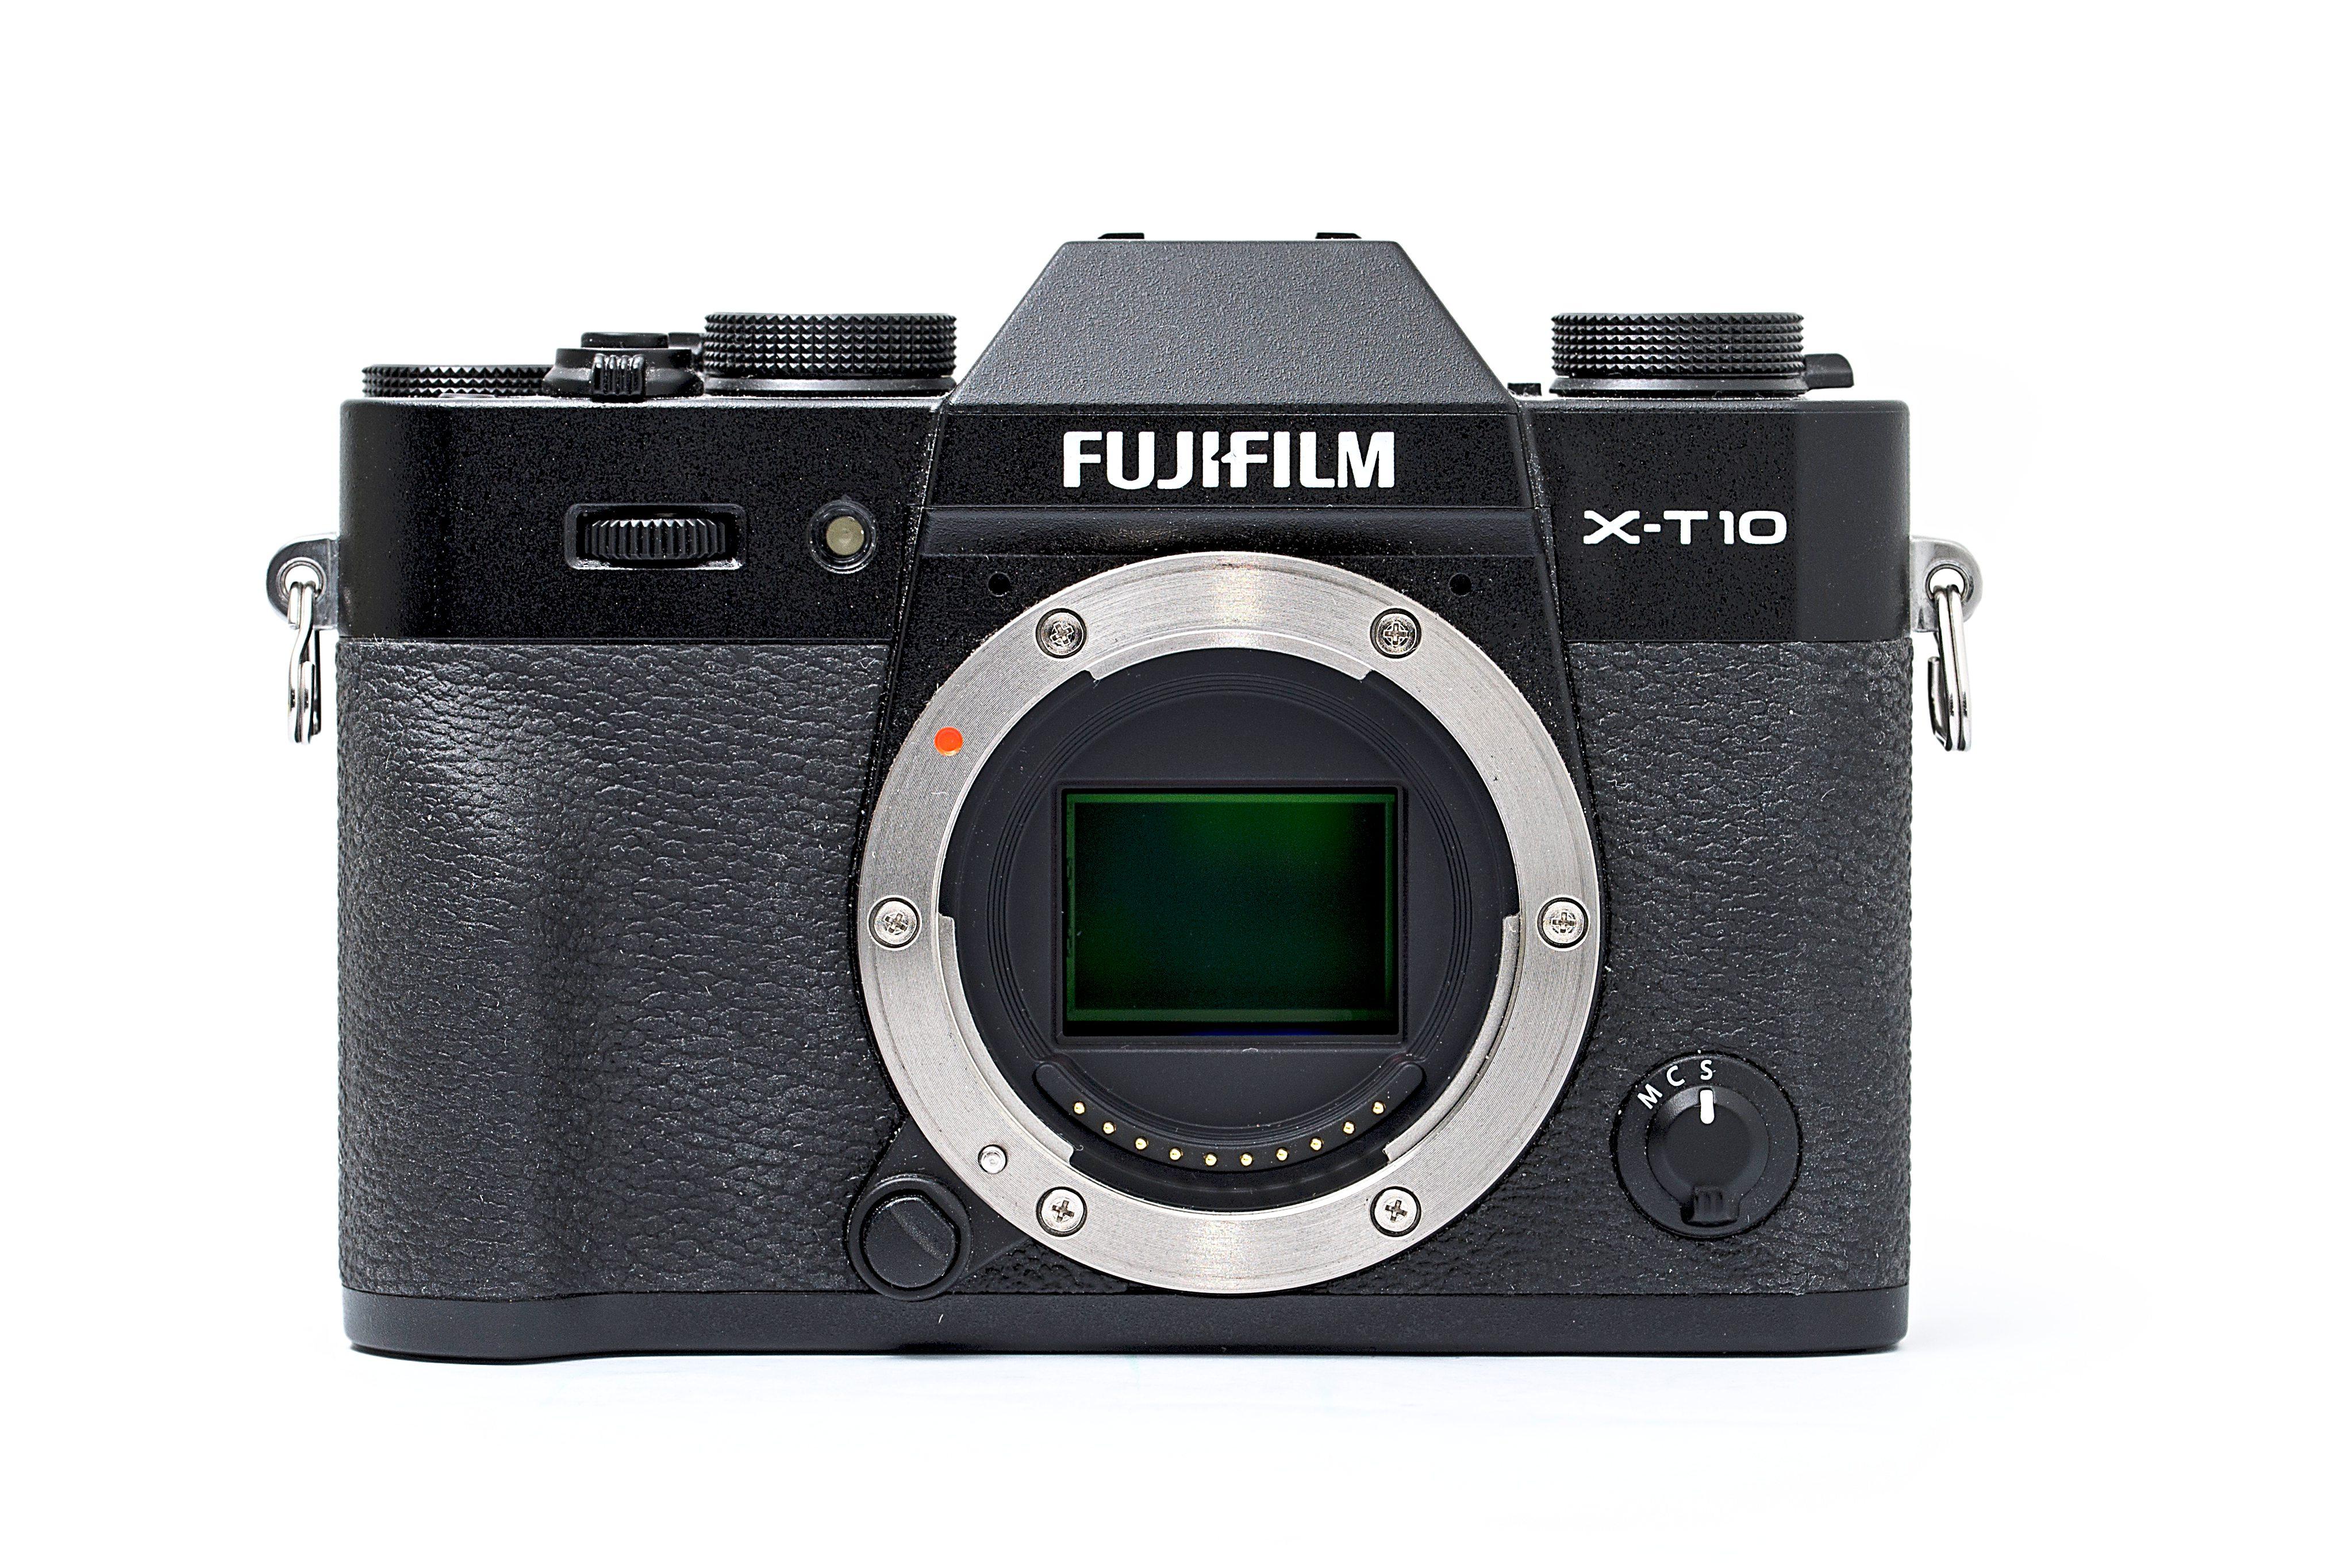 Large sensor, small camera: despite its compact size, the Fuji X-T10 has a larger sensor than Micro Four Thirds cameras